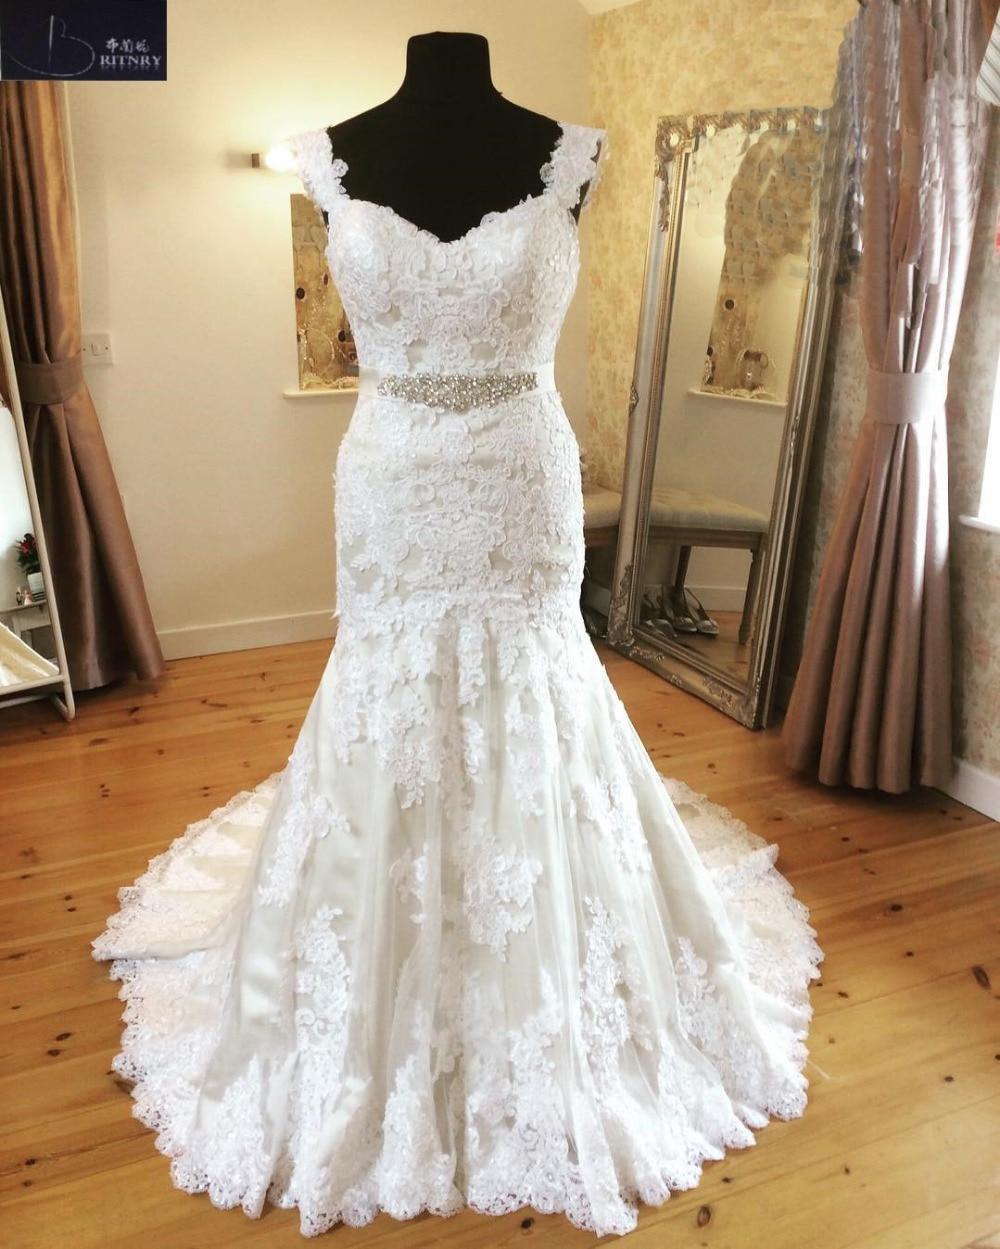 Sweetheart Lace Wedding Dress: Aliexpress.com : Buy Charming Sweetheart Lace Mermaid